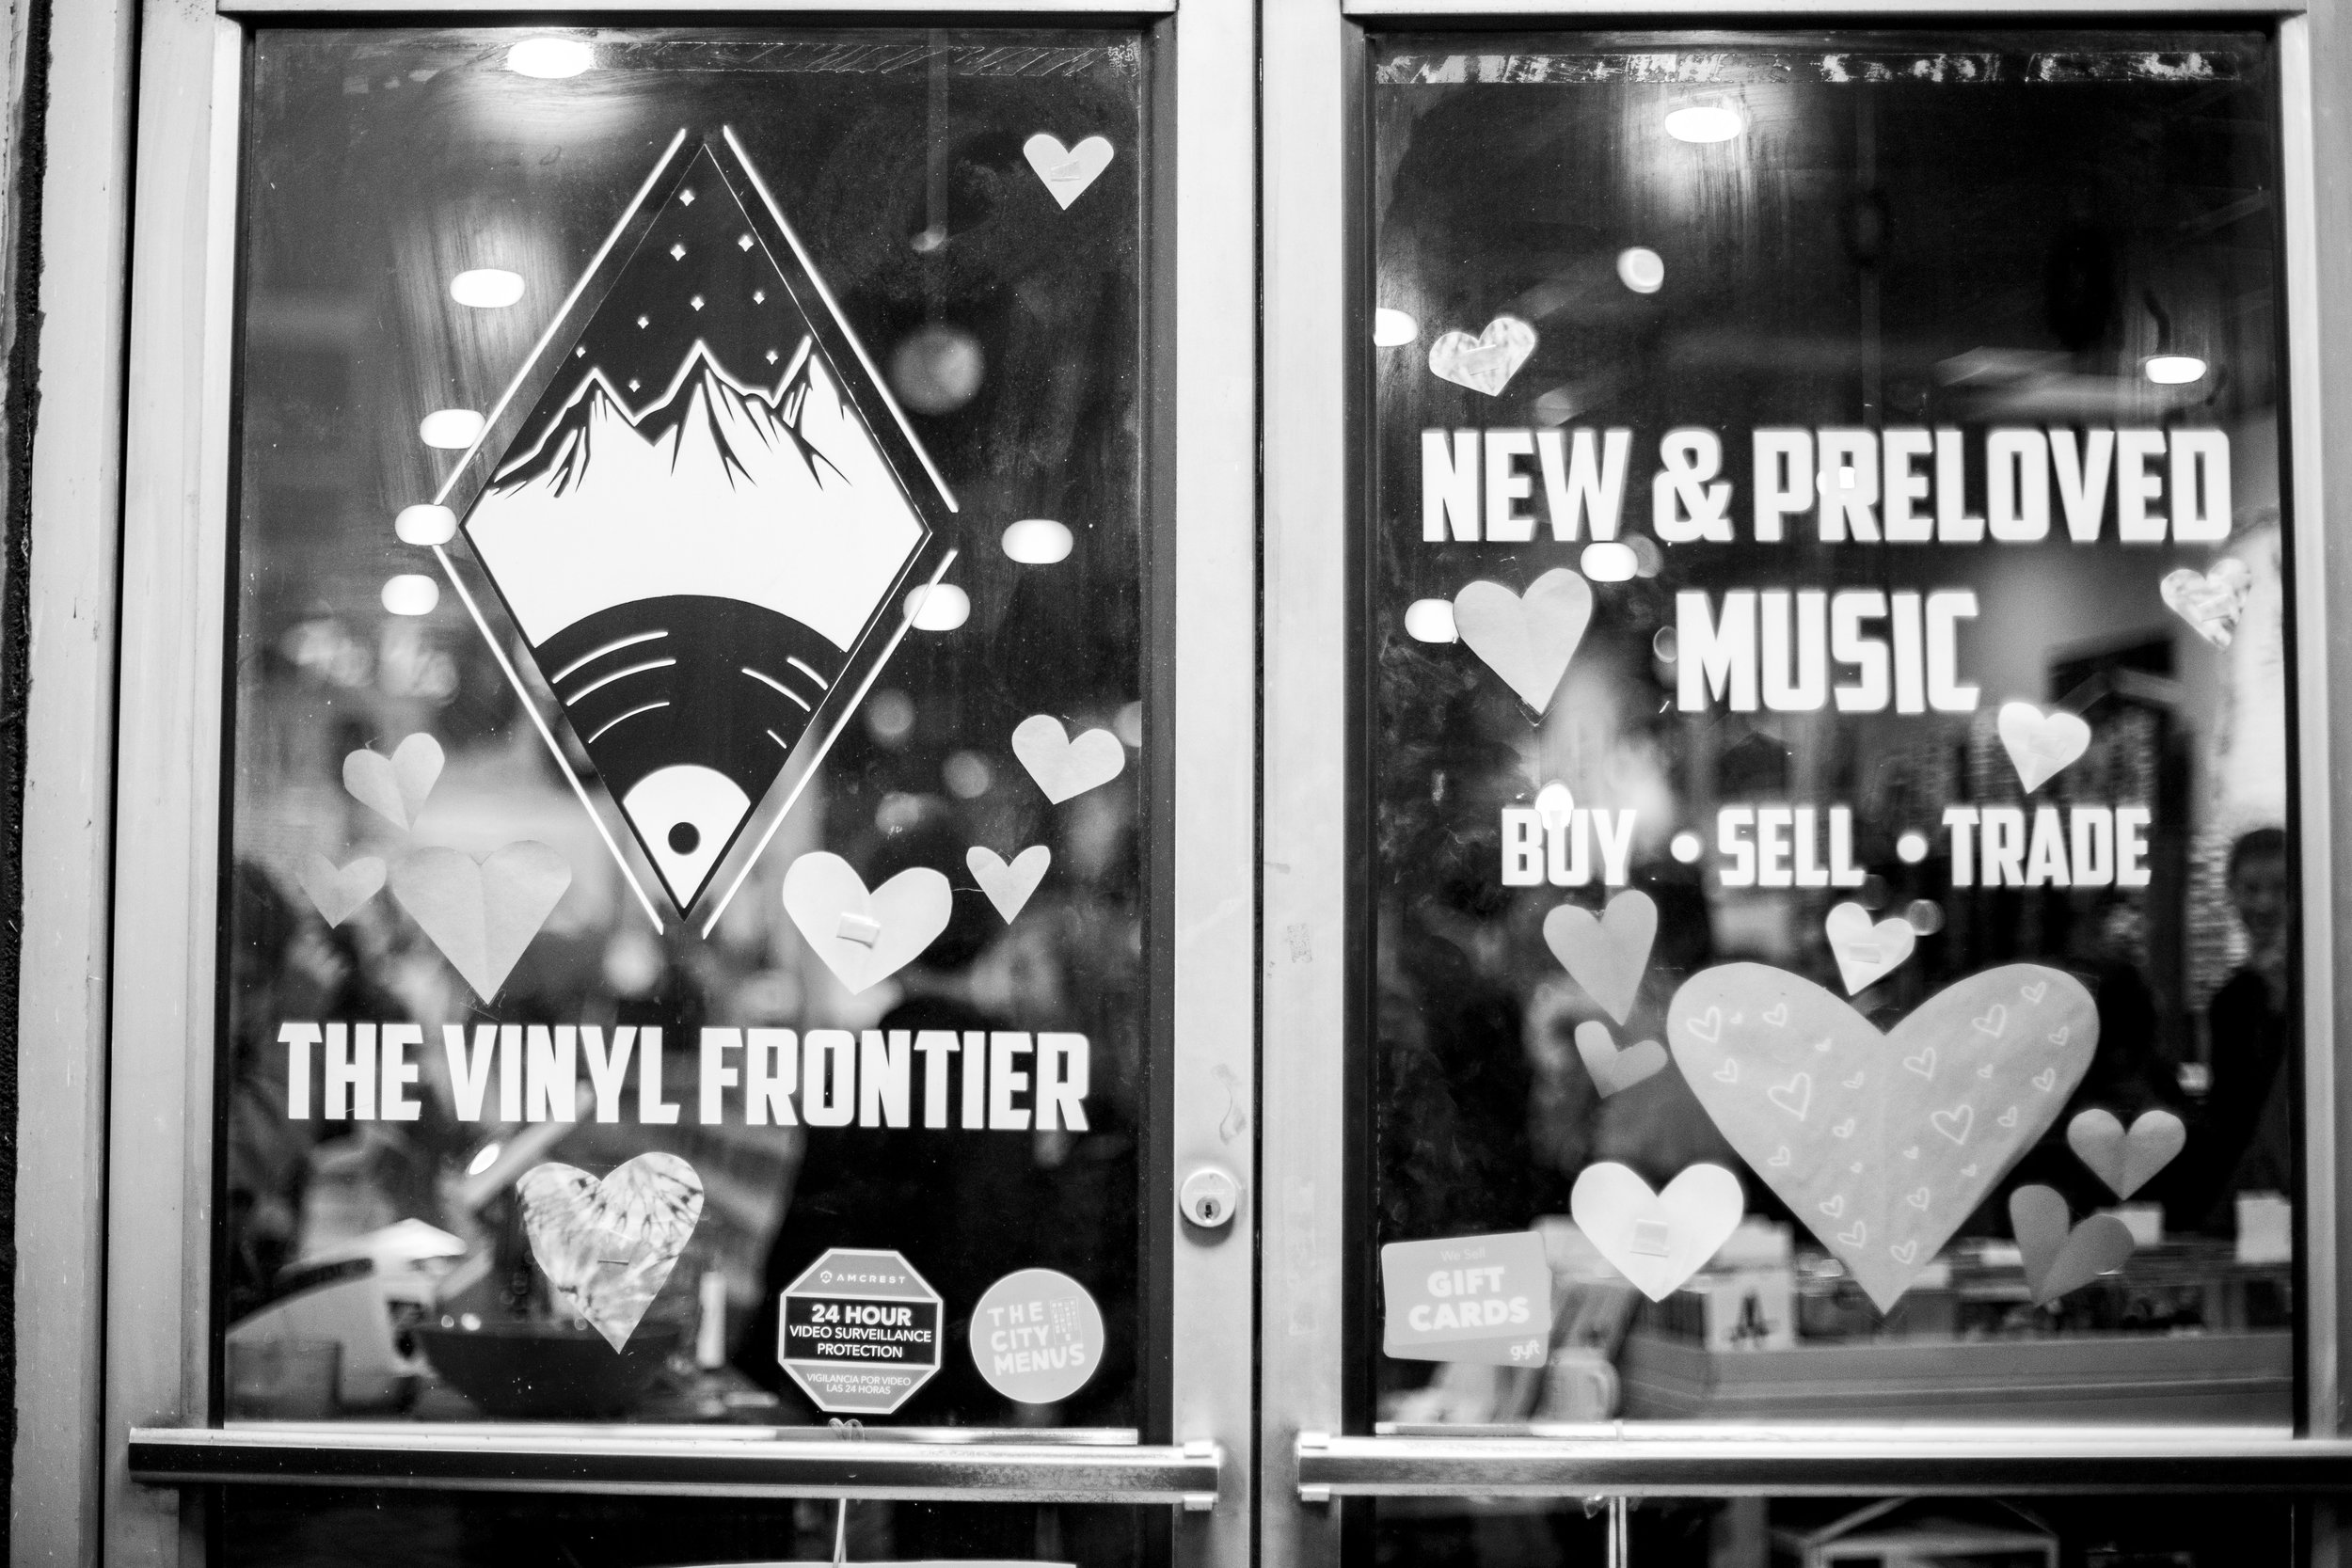 PBD_VinylFrontier_17.jpg